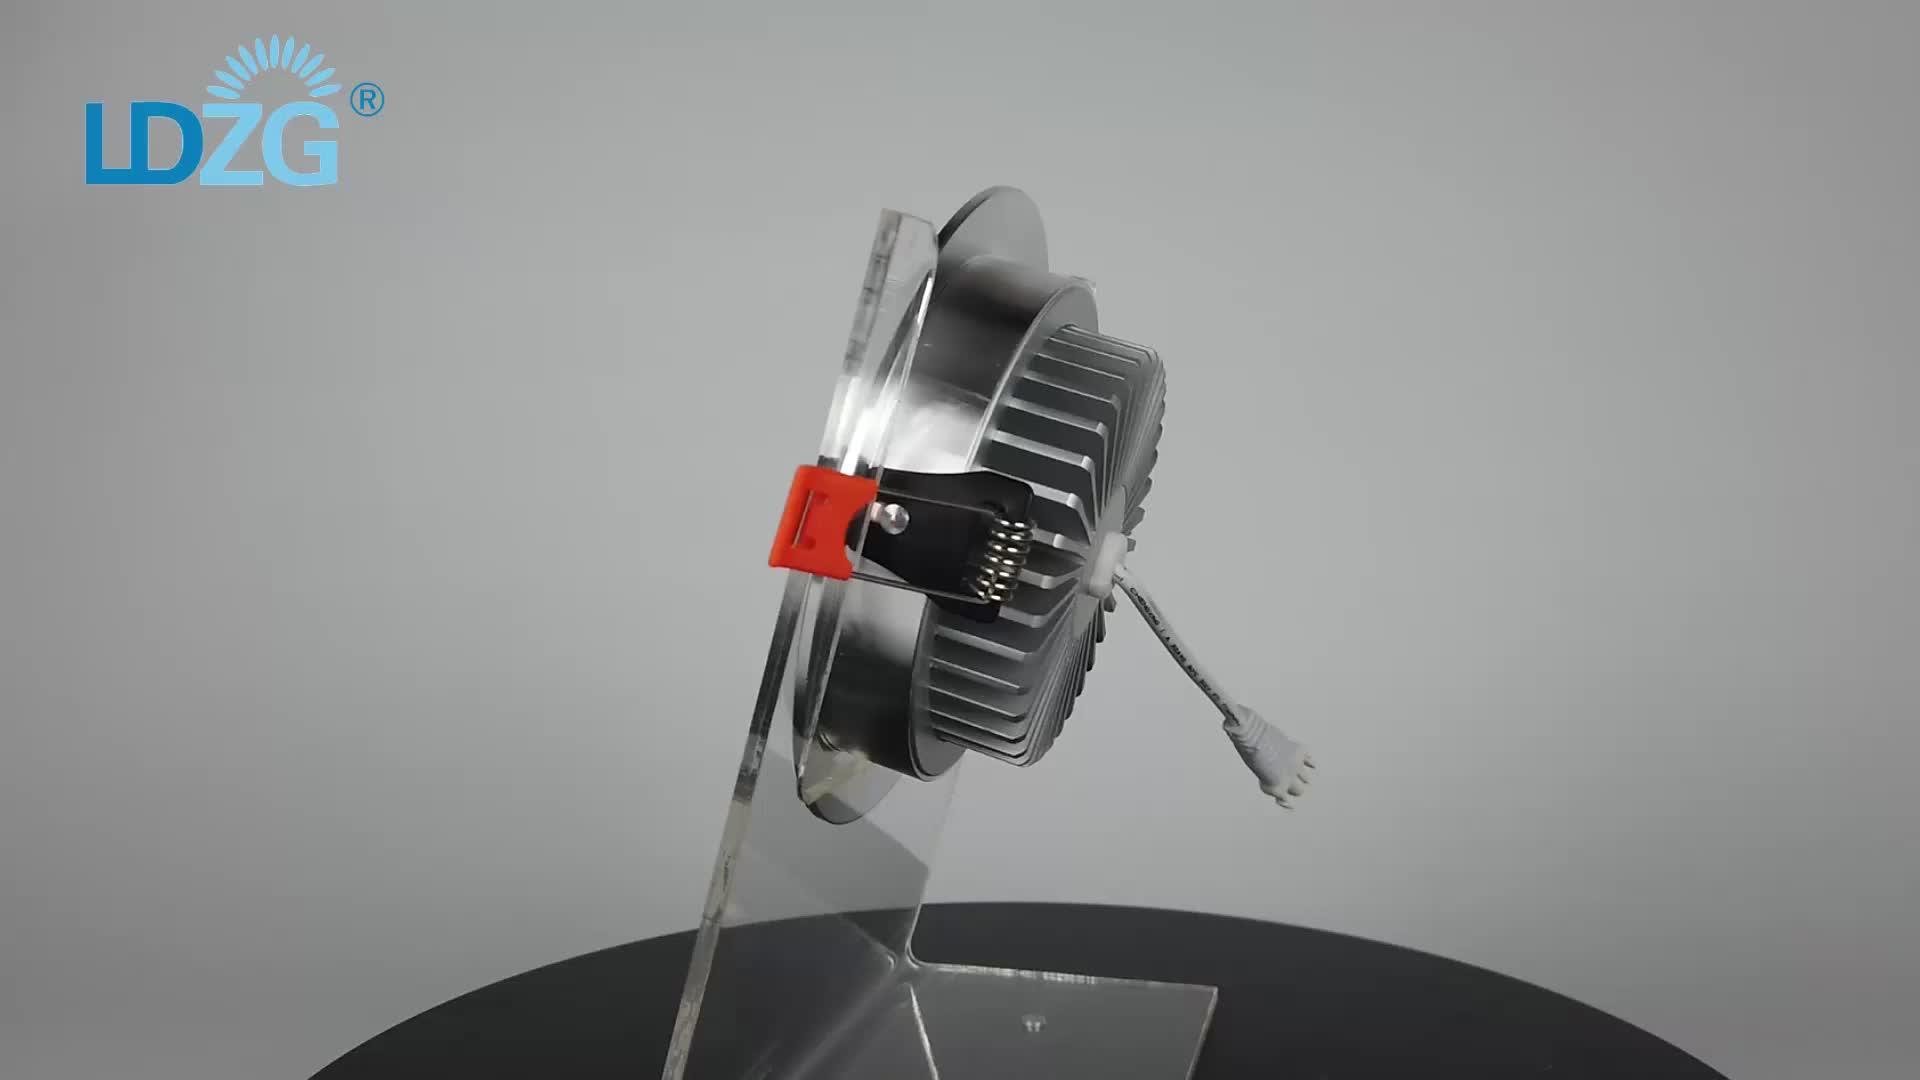 Ronde Witte Chroom Zilver Ultra Dunne Aluminium 3 W 5w7w 9 W 18 W 24 W 220V Plafond Led inbouwspot